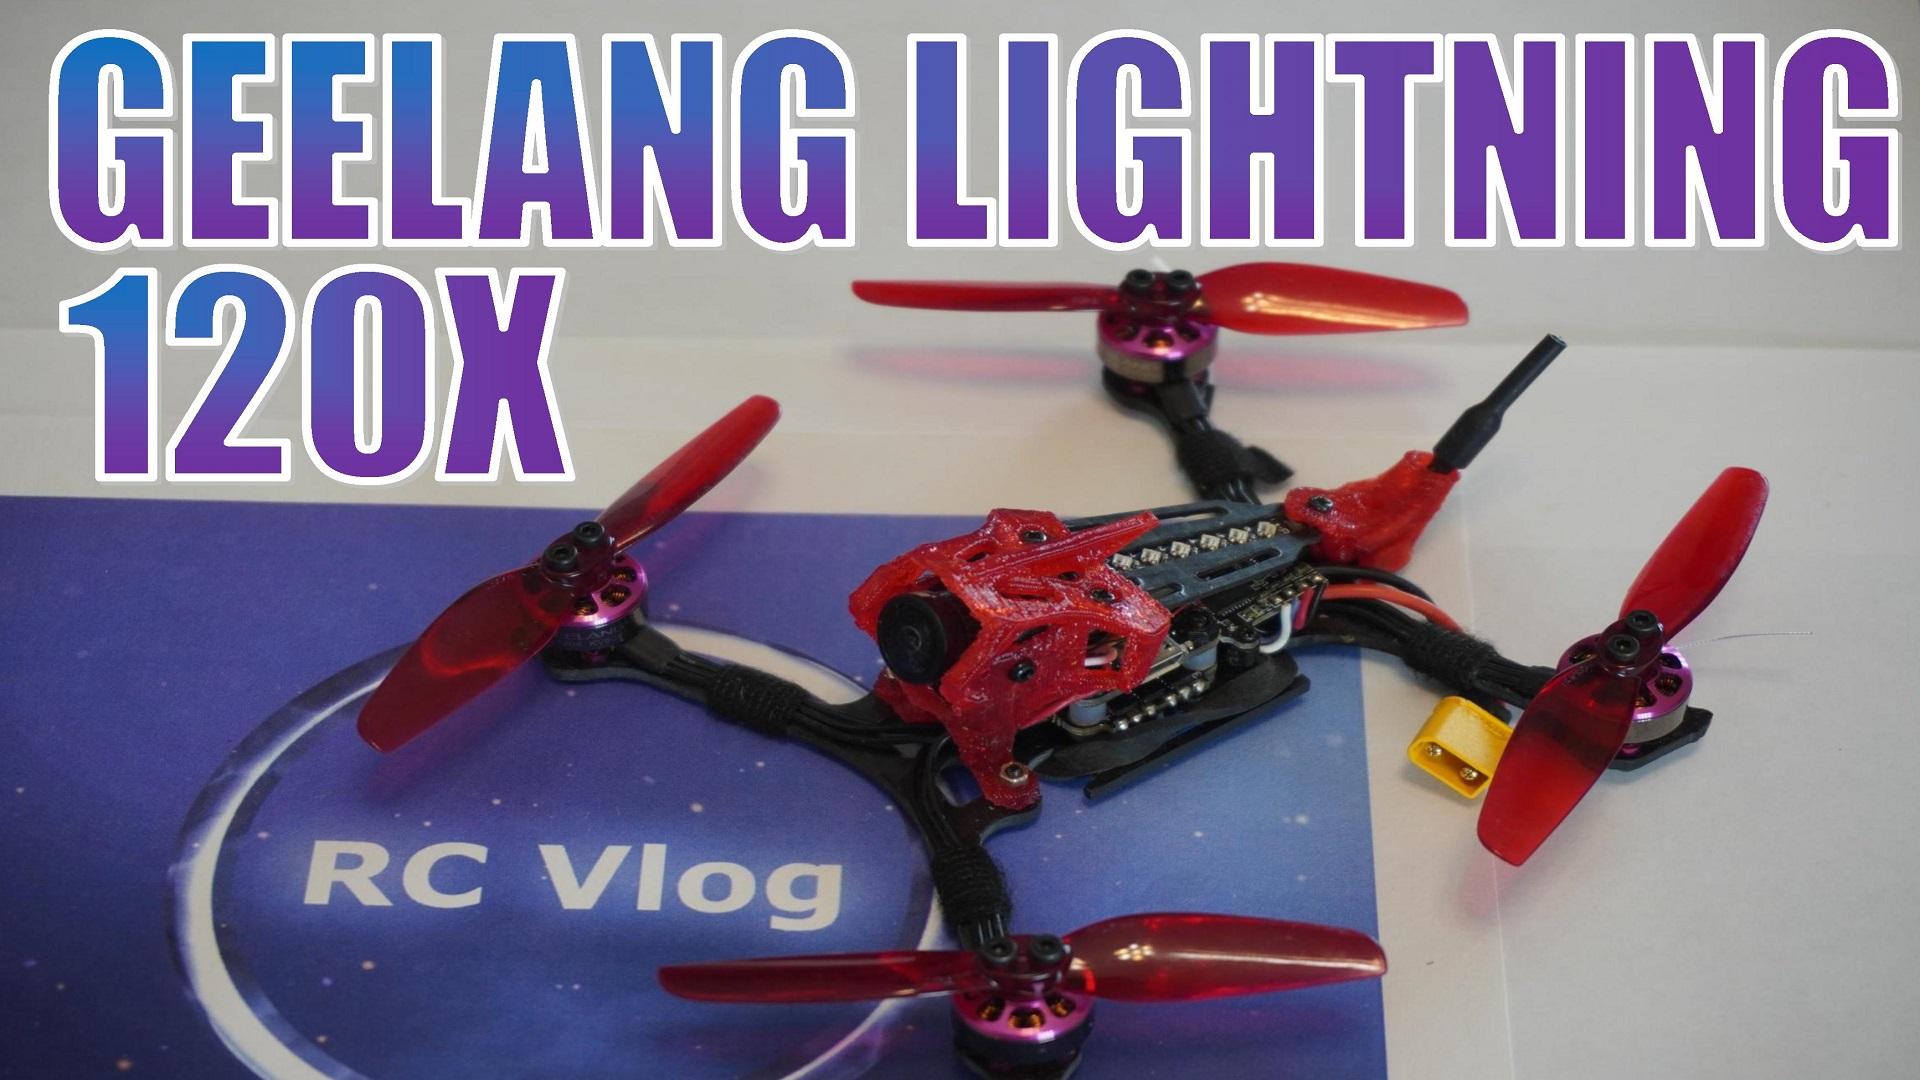 GEELANG Lightning 120X 120mm F4 12A 2-4S 3 Inch Whoop FPV Racing Drone PNP BNF w/ 25-200mW VTX Runcam Nano 2 Camera